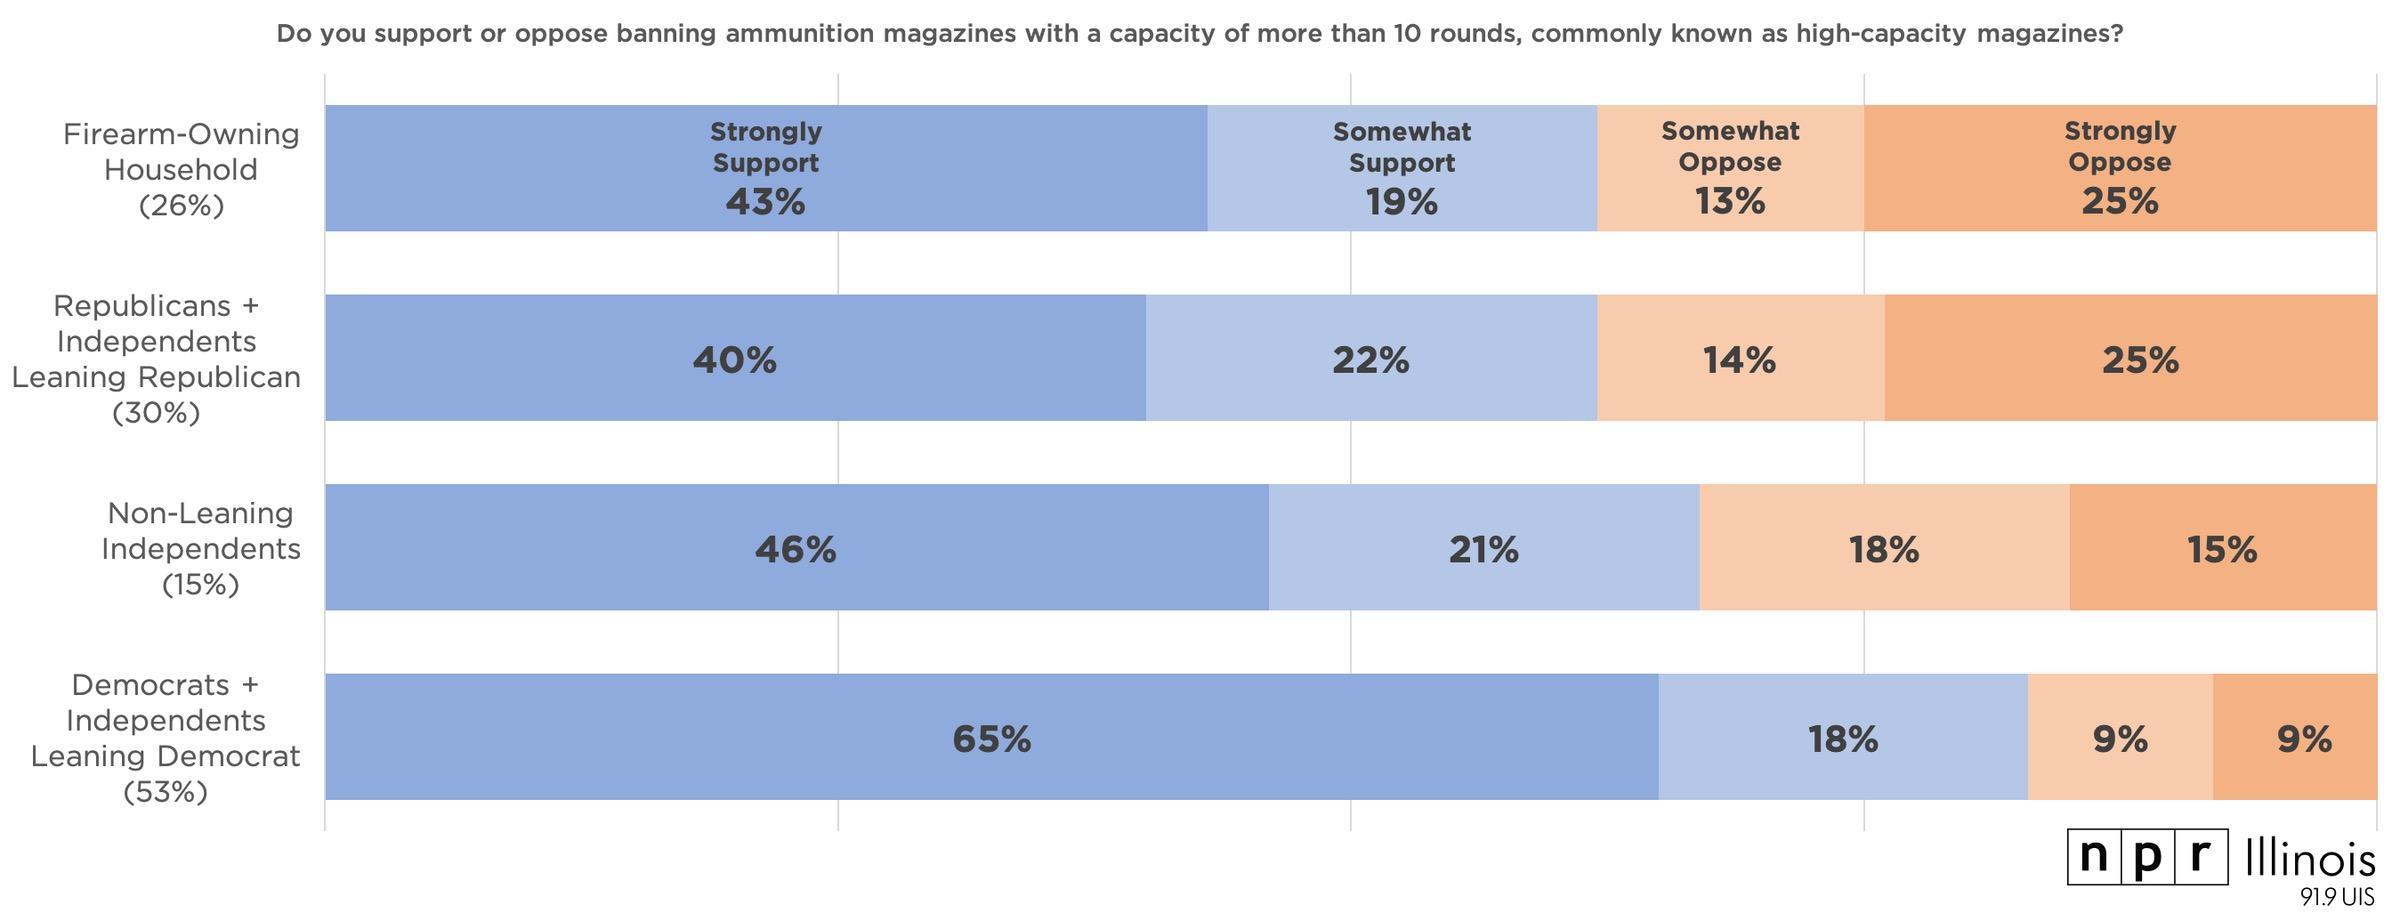 2019-10-13-survey-guns-magazines_2.jpg